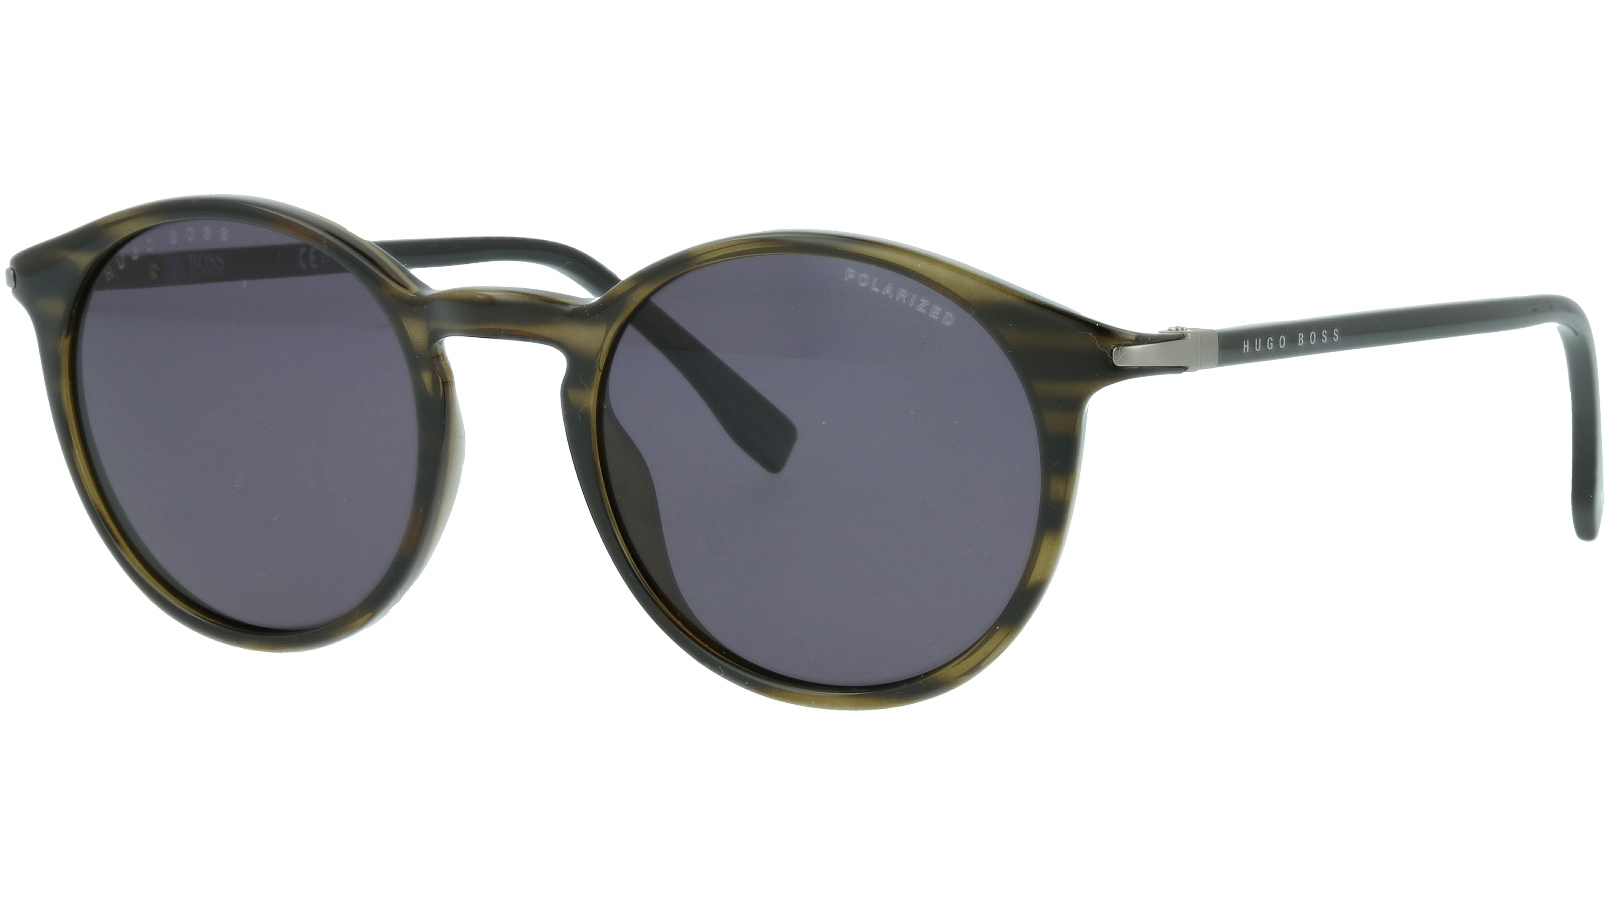 HUGO BOSS BOSS1003/S PZHM9 50 STRIPED Sunglasses